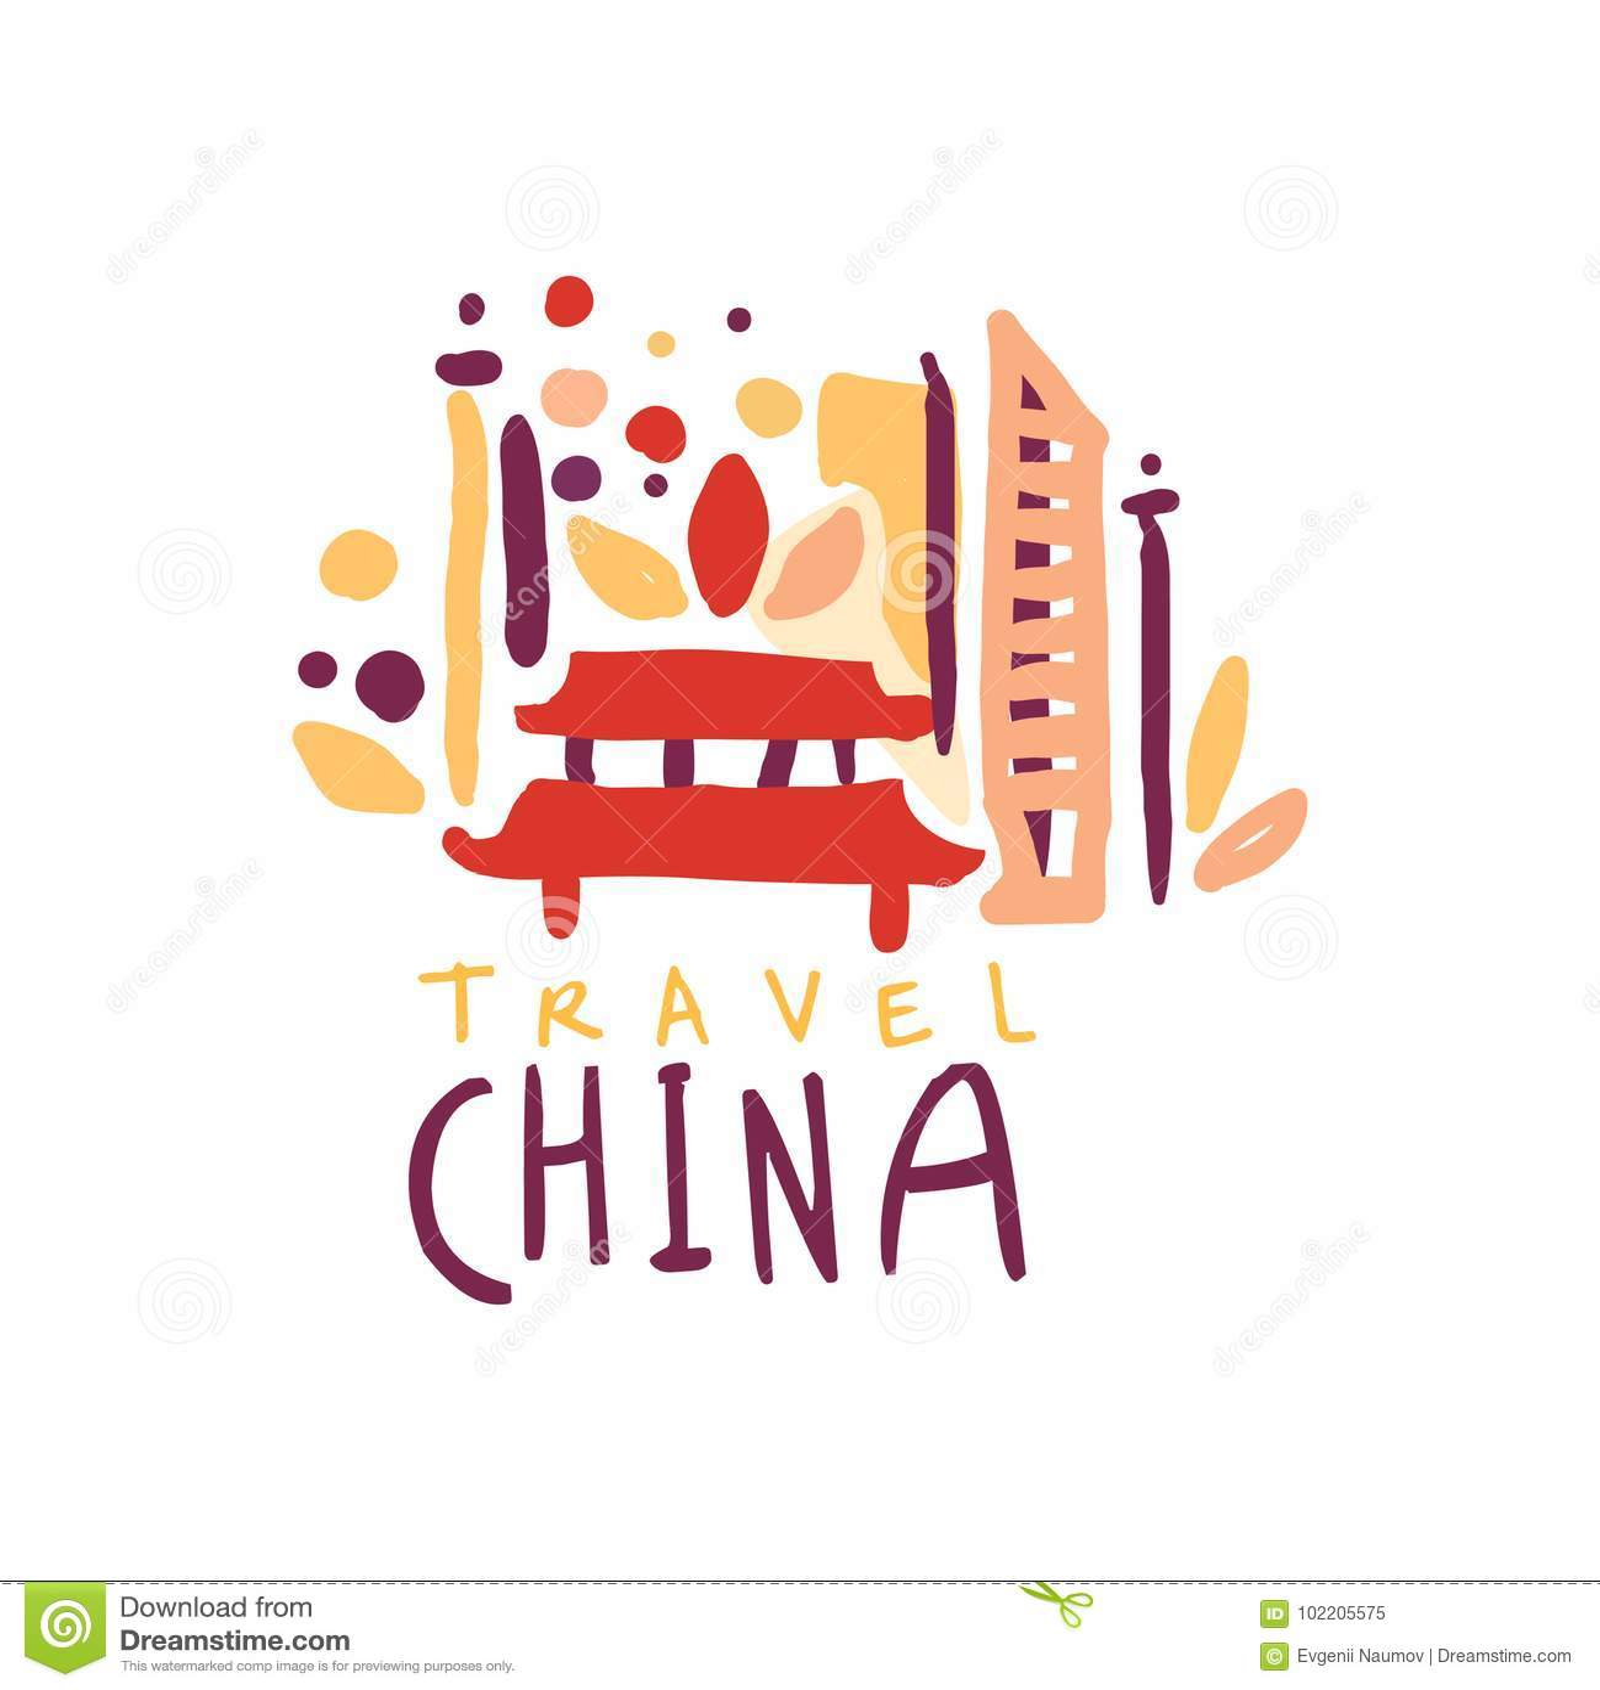 Travel to China logo with landmarks